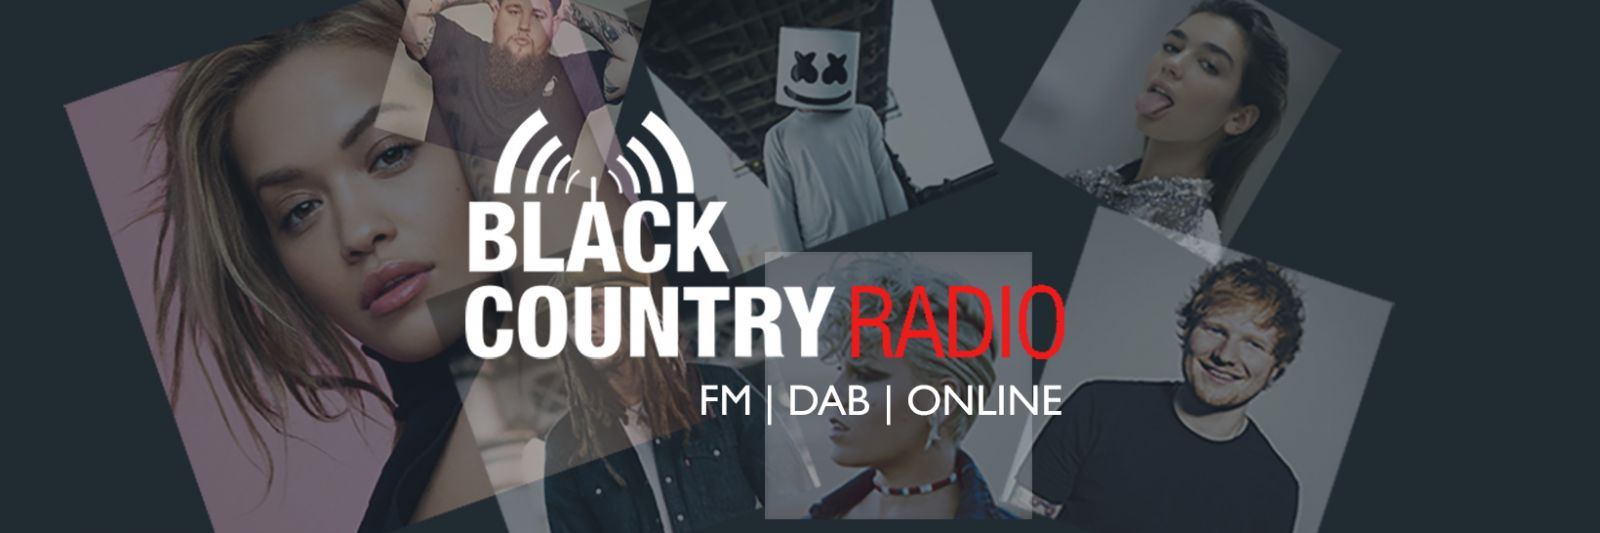 Black Country Radio.jpg